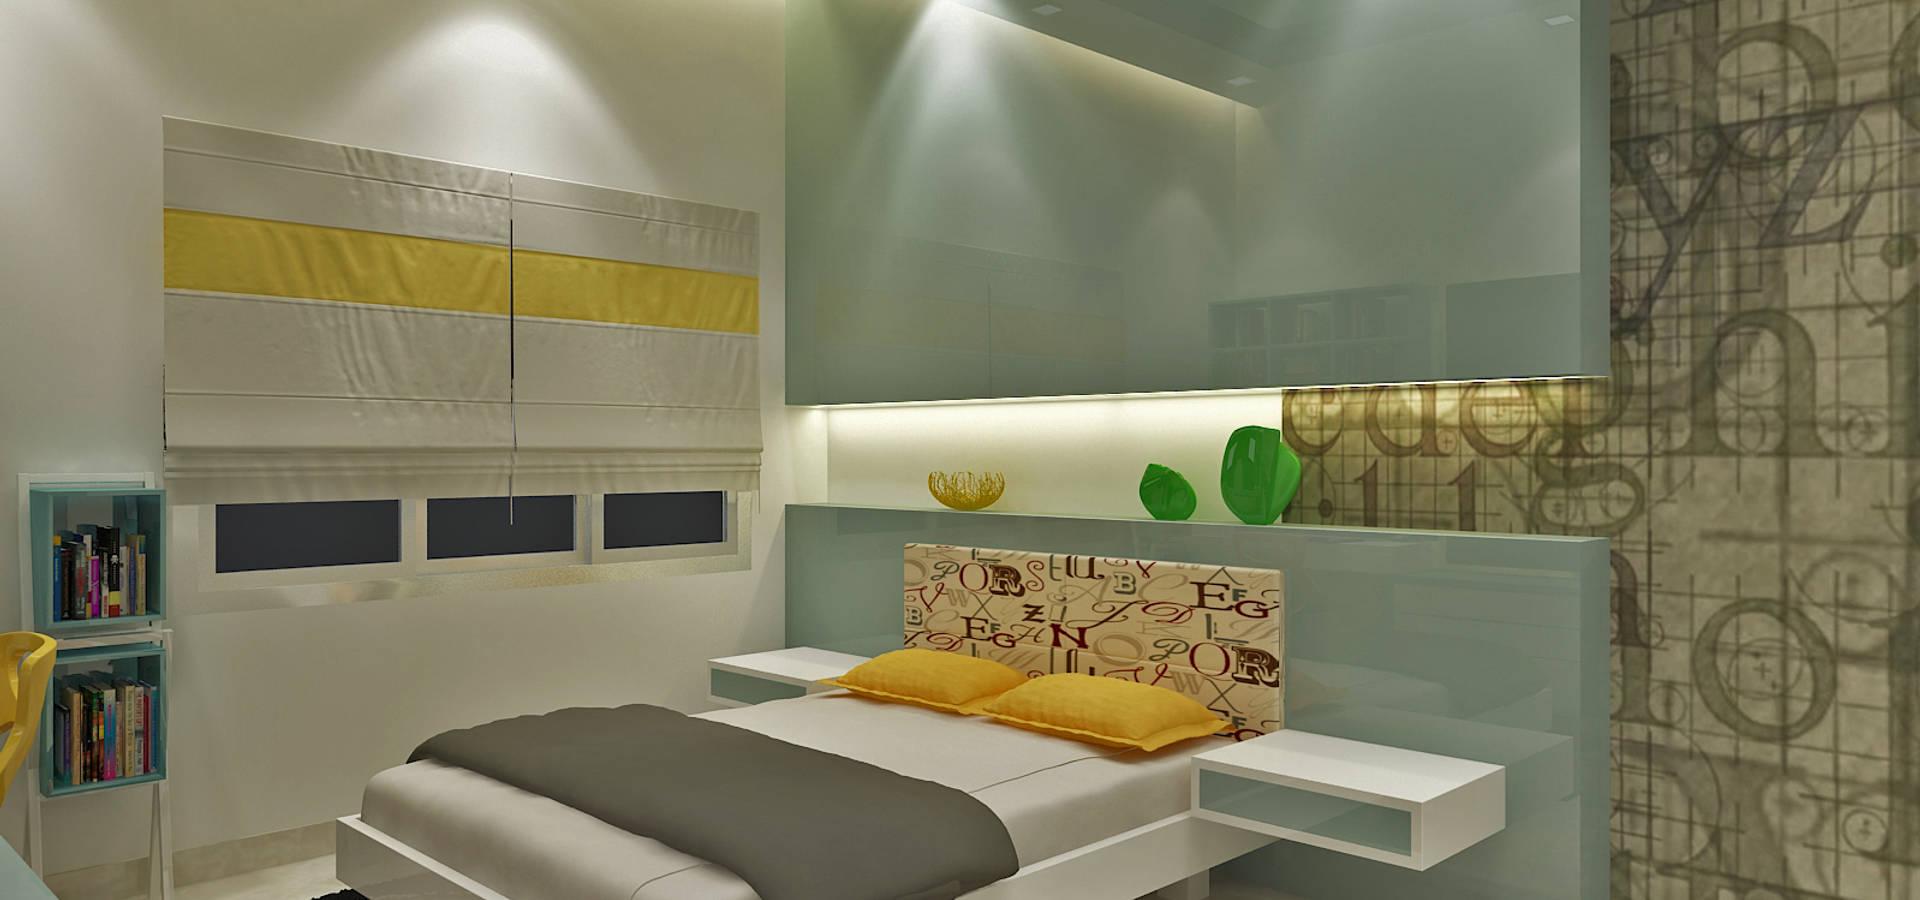 vasantha architects and interior designers